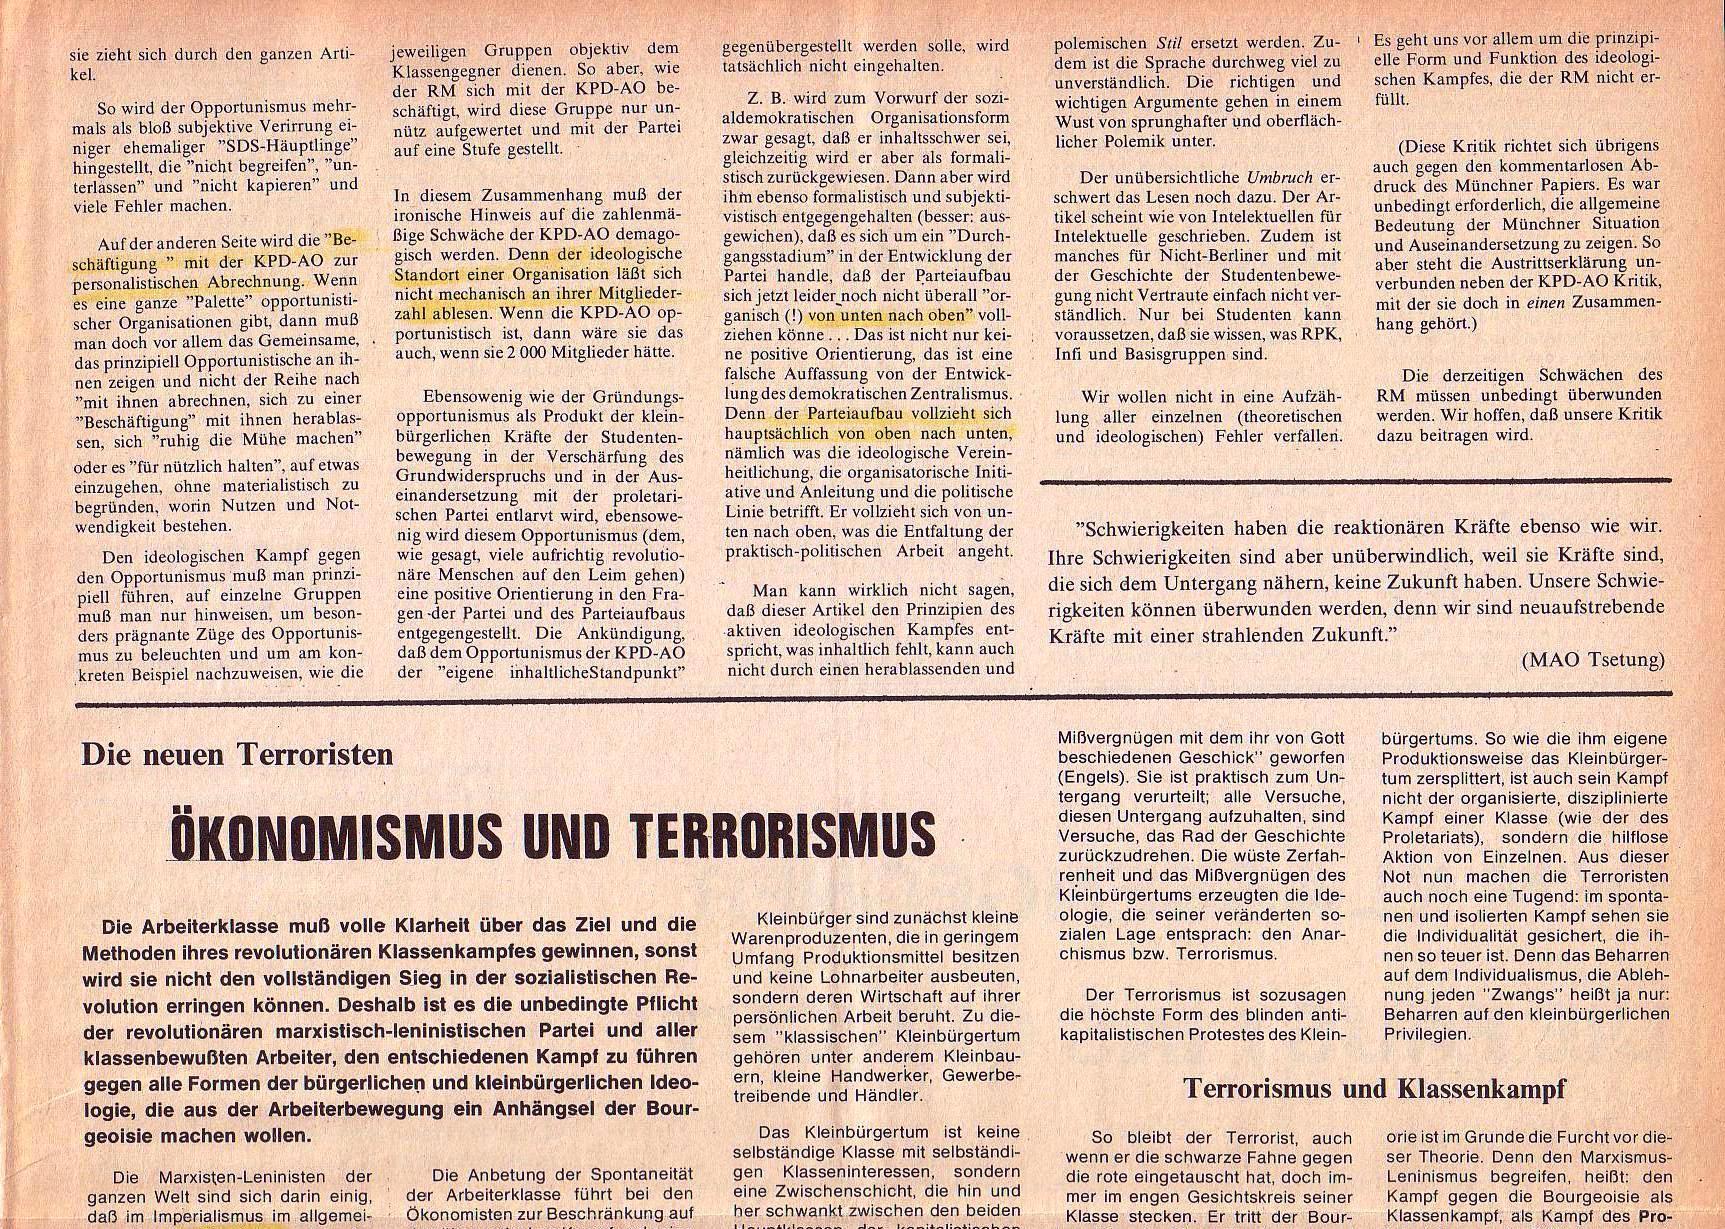 Roter Morgen, 4. Jg., September 1970, Nr. 8, Seite 7a